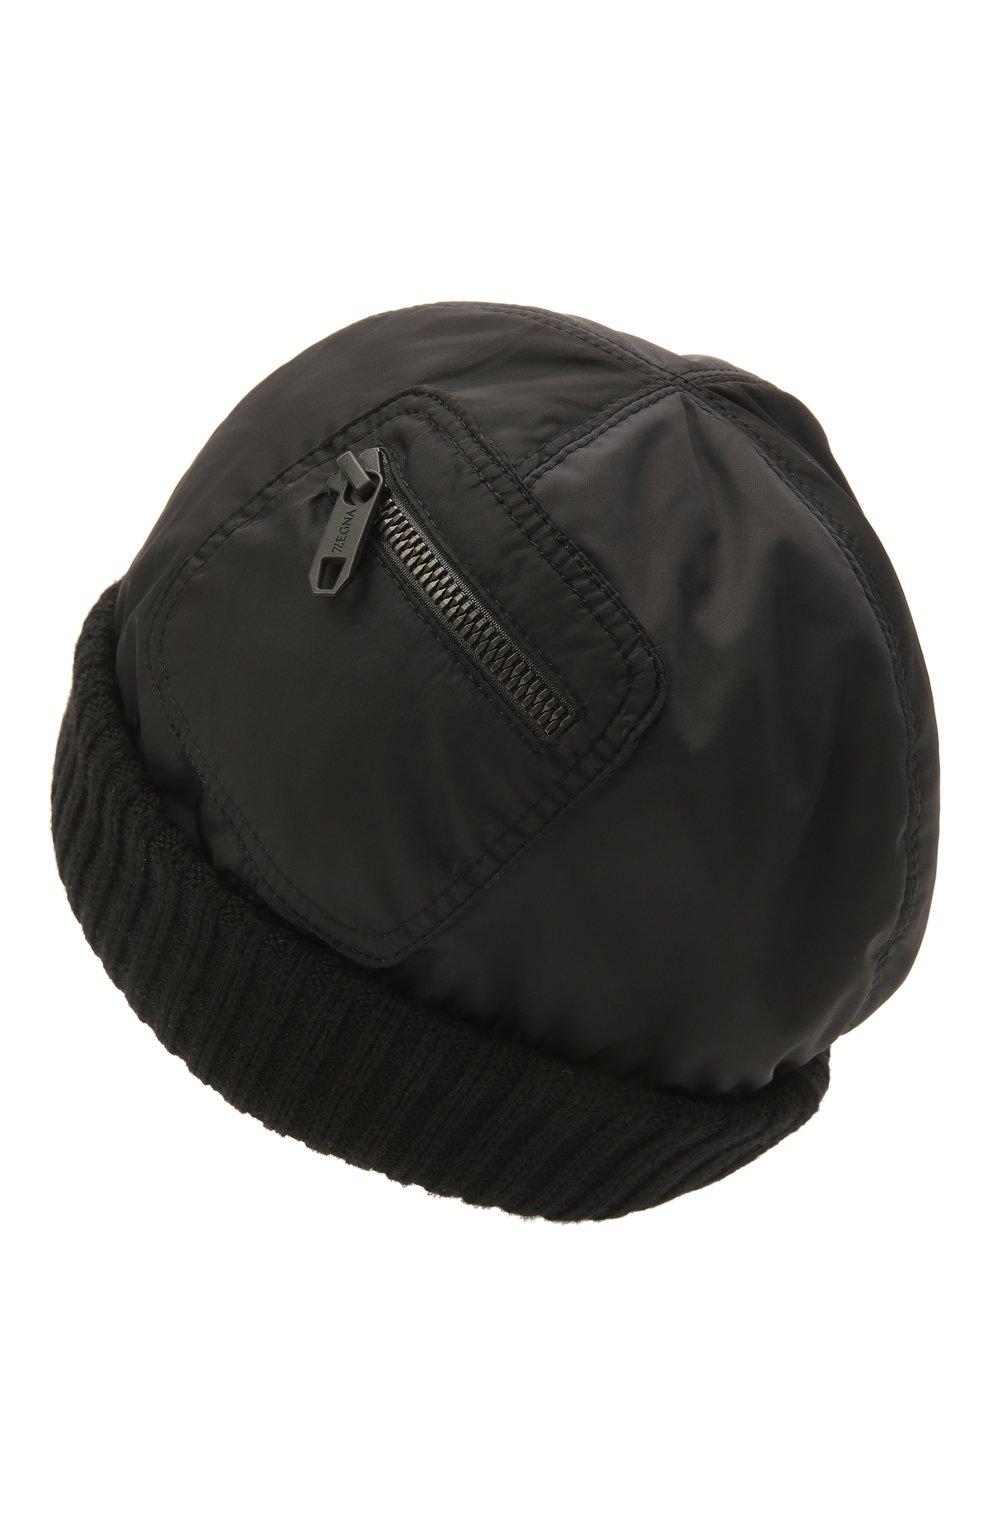 Мужская утепленная шапка Z ZEGNA черного цвета, арт. Z2I74H/B2W | Фото 2 (Материал: Текстиль; Кросс-КТ: Трикотаж)